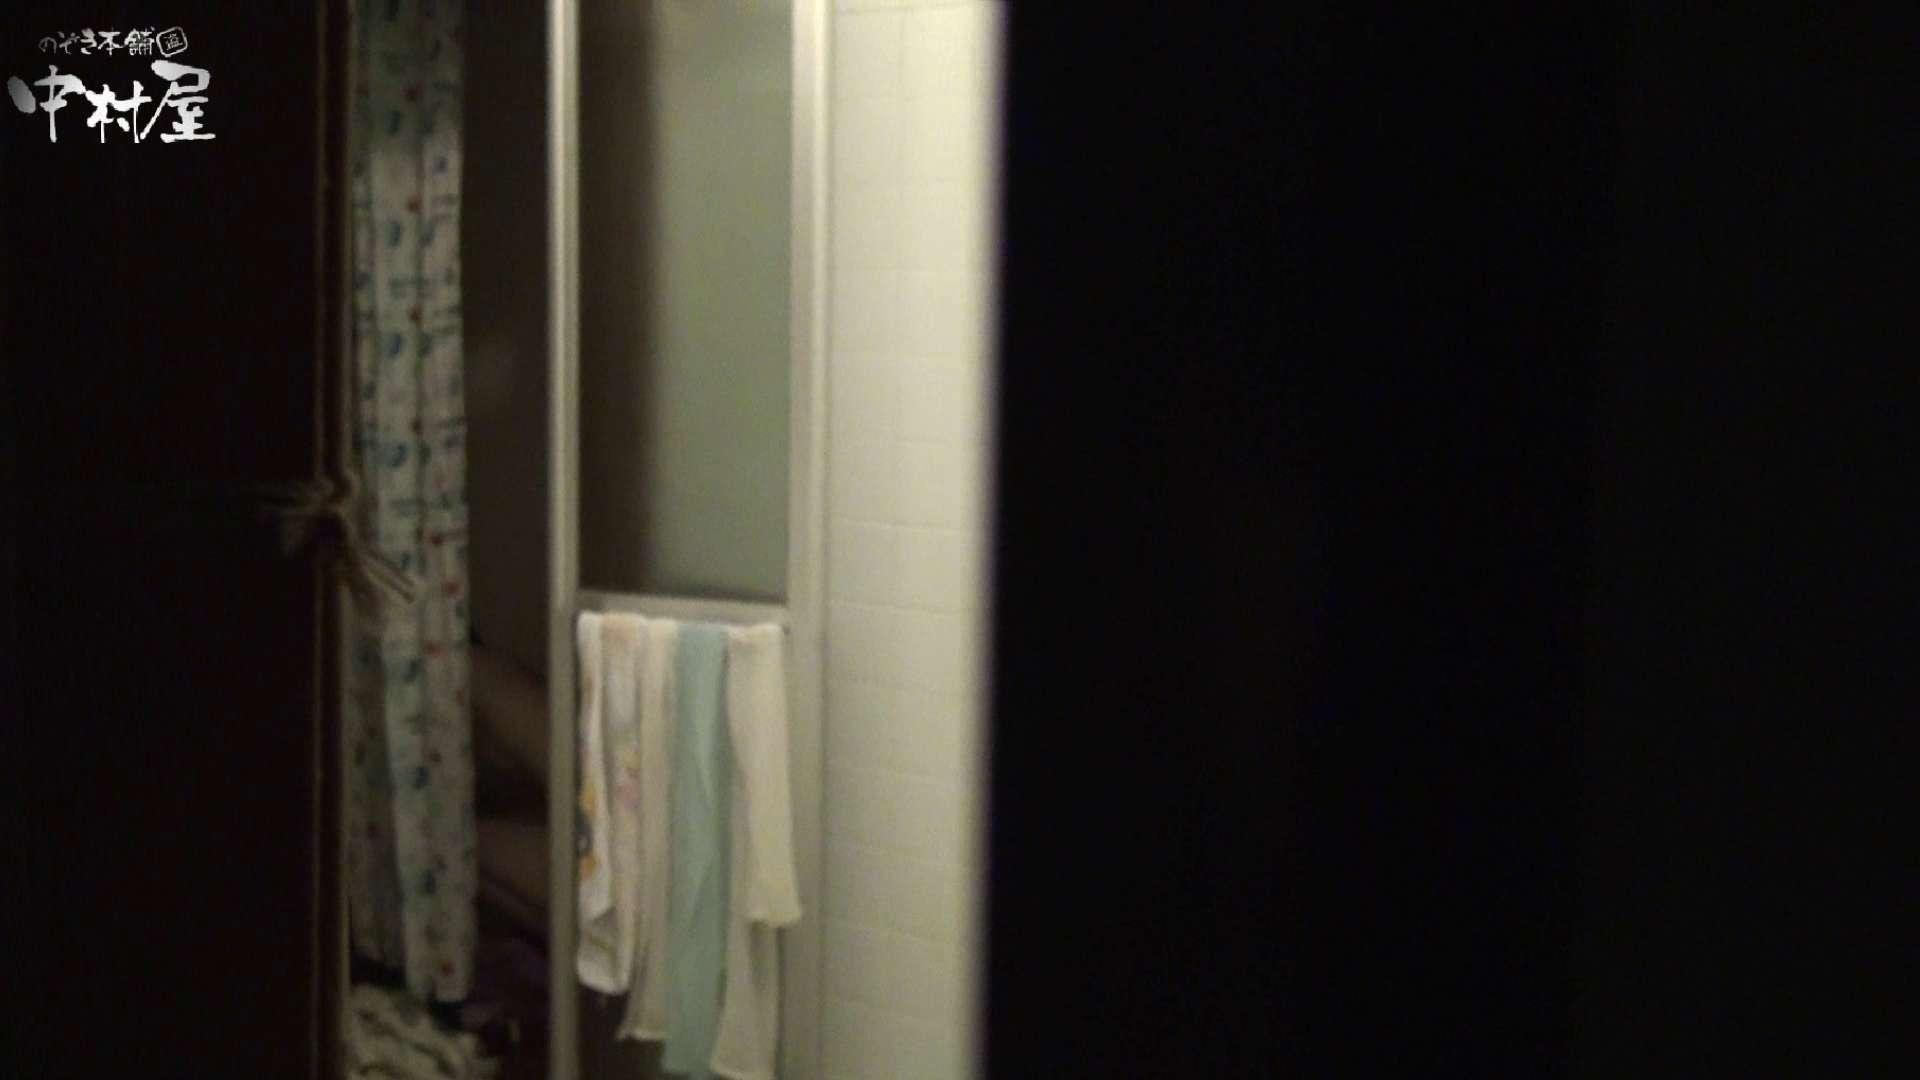 民家風呂専門盗撮師の超危険映像 vol.029 股間 | OLのエロ生活  26連発 19